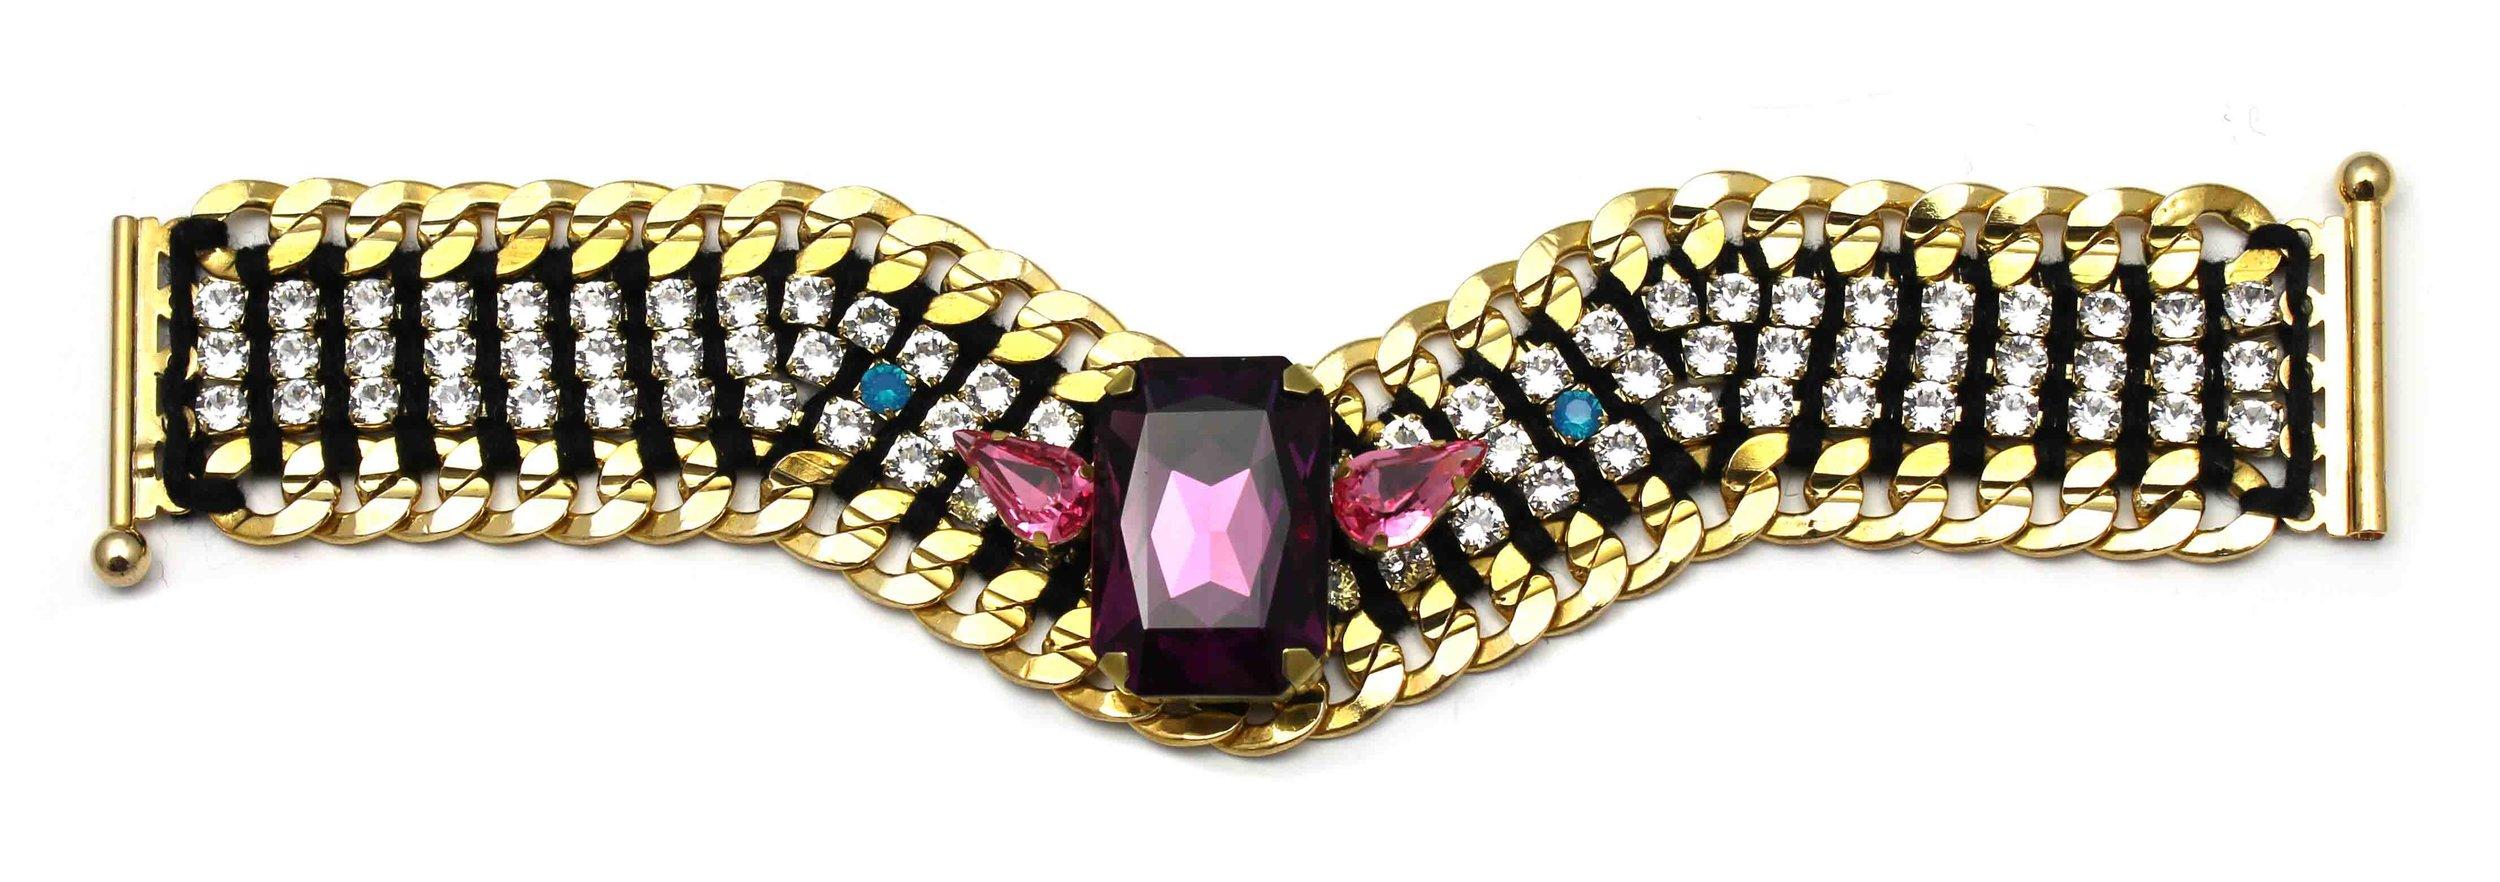 145C Tropicana Crystal V Bracelet - Crystal.jpg